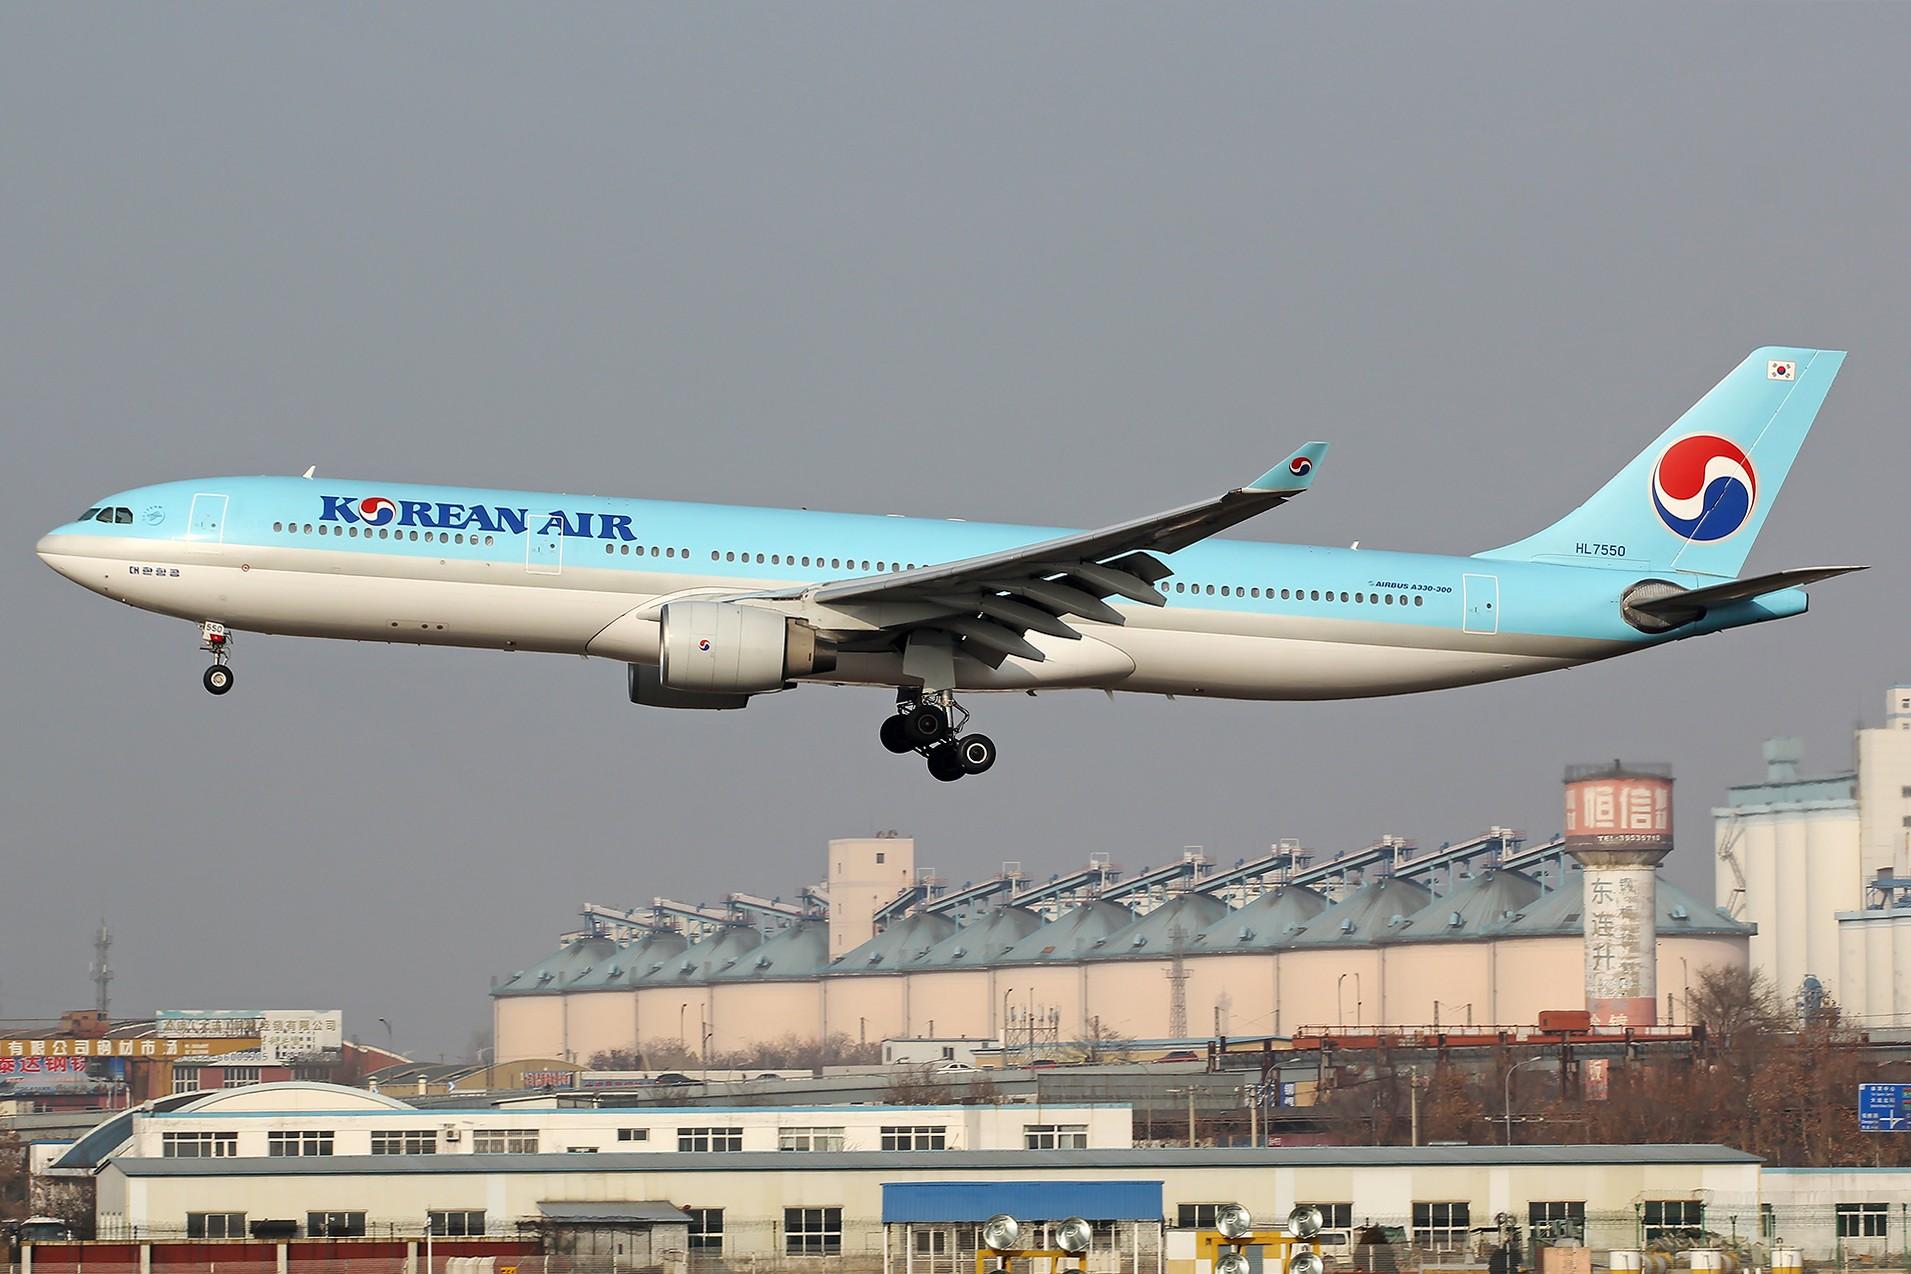 Re:[原创][DLC]。。。省略号吧,无标题。。。 AIRBUS A330-300 HL7550 中国大连国际机场